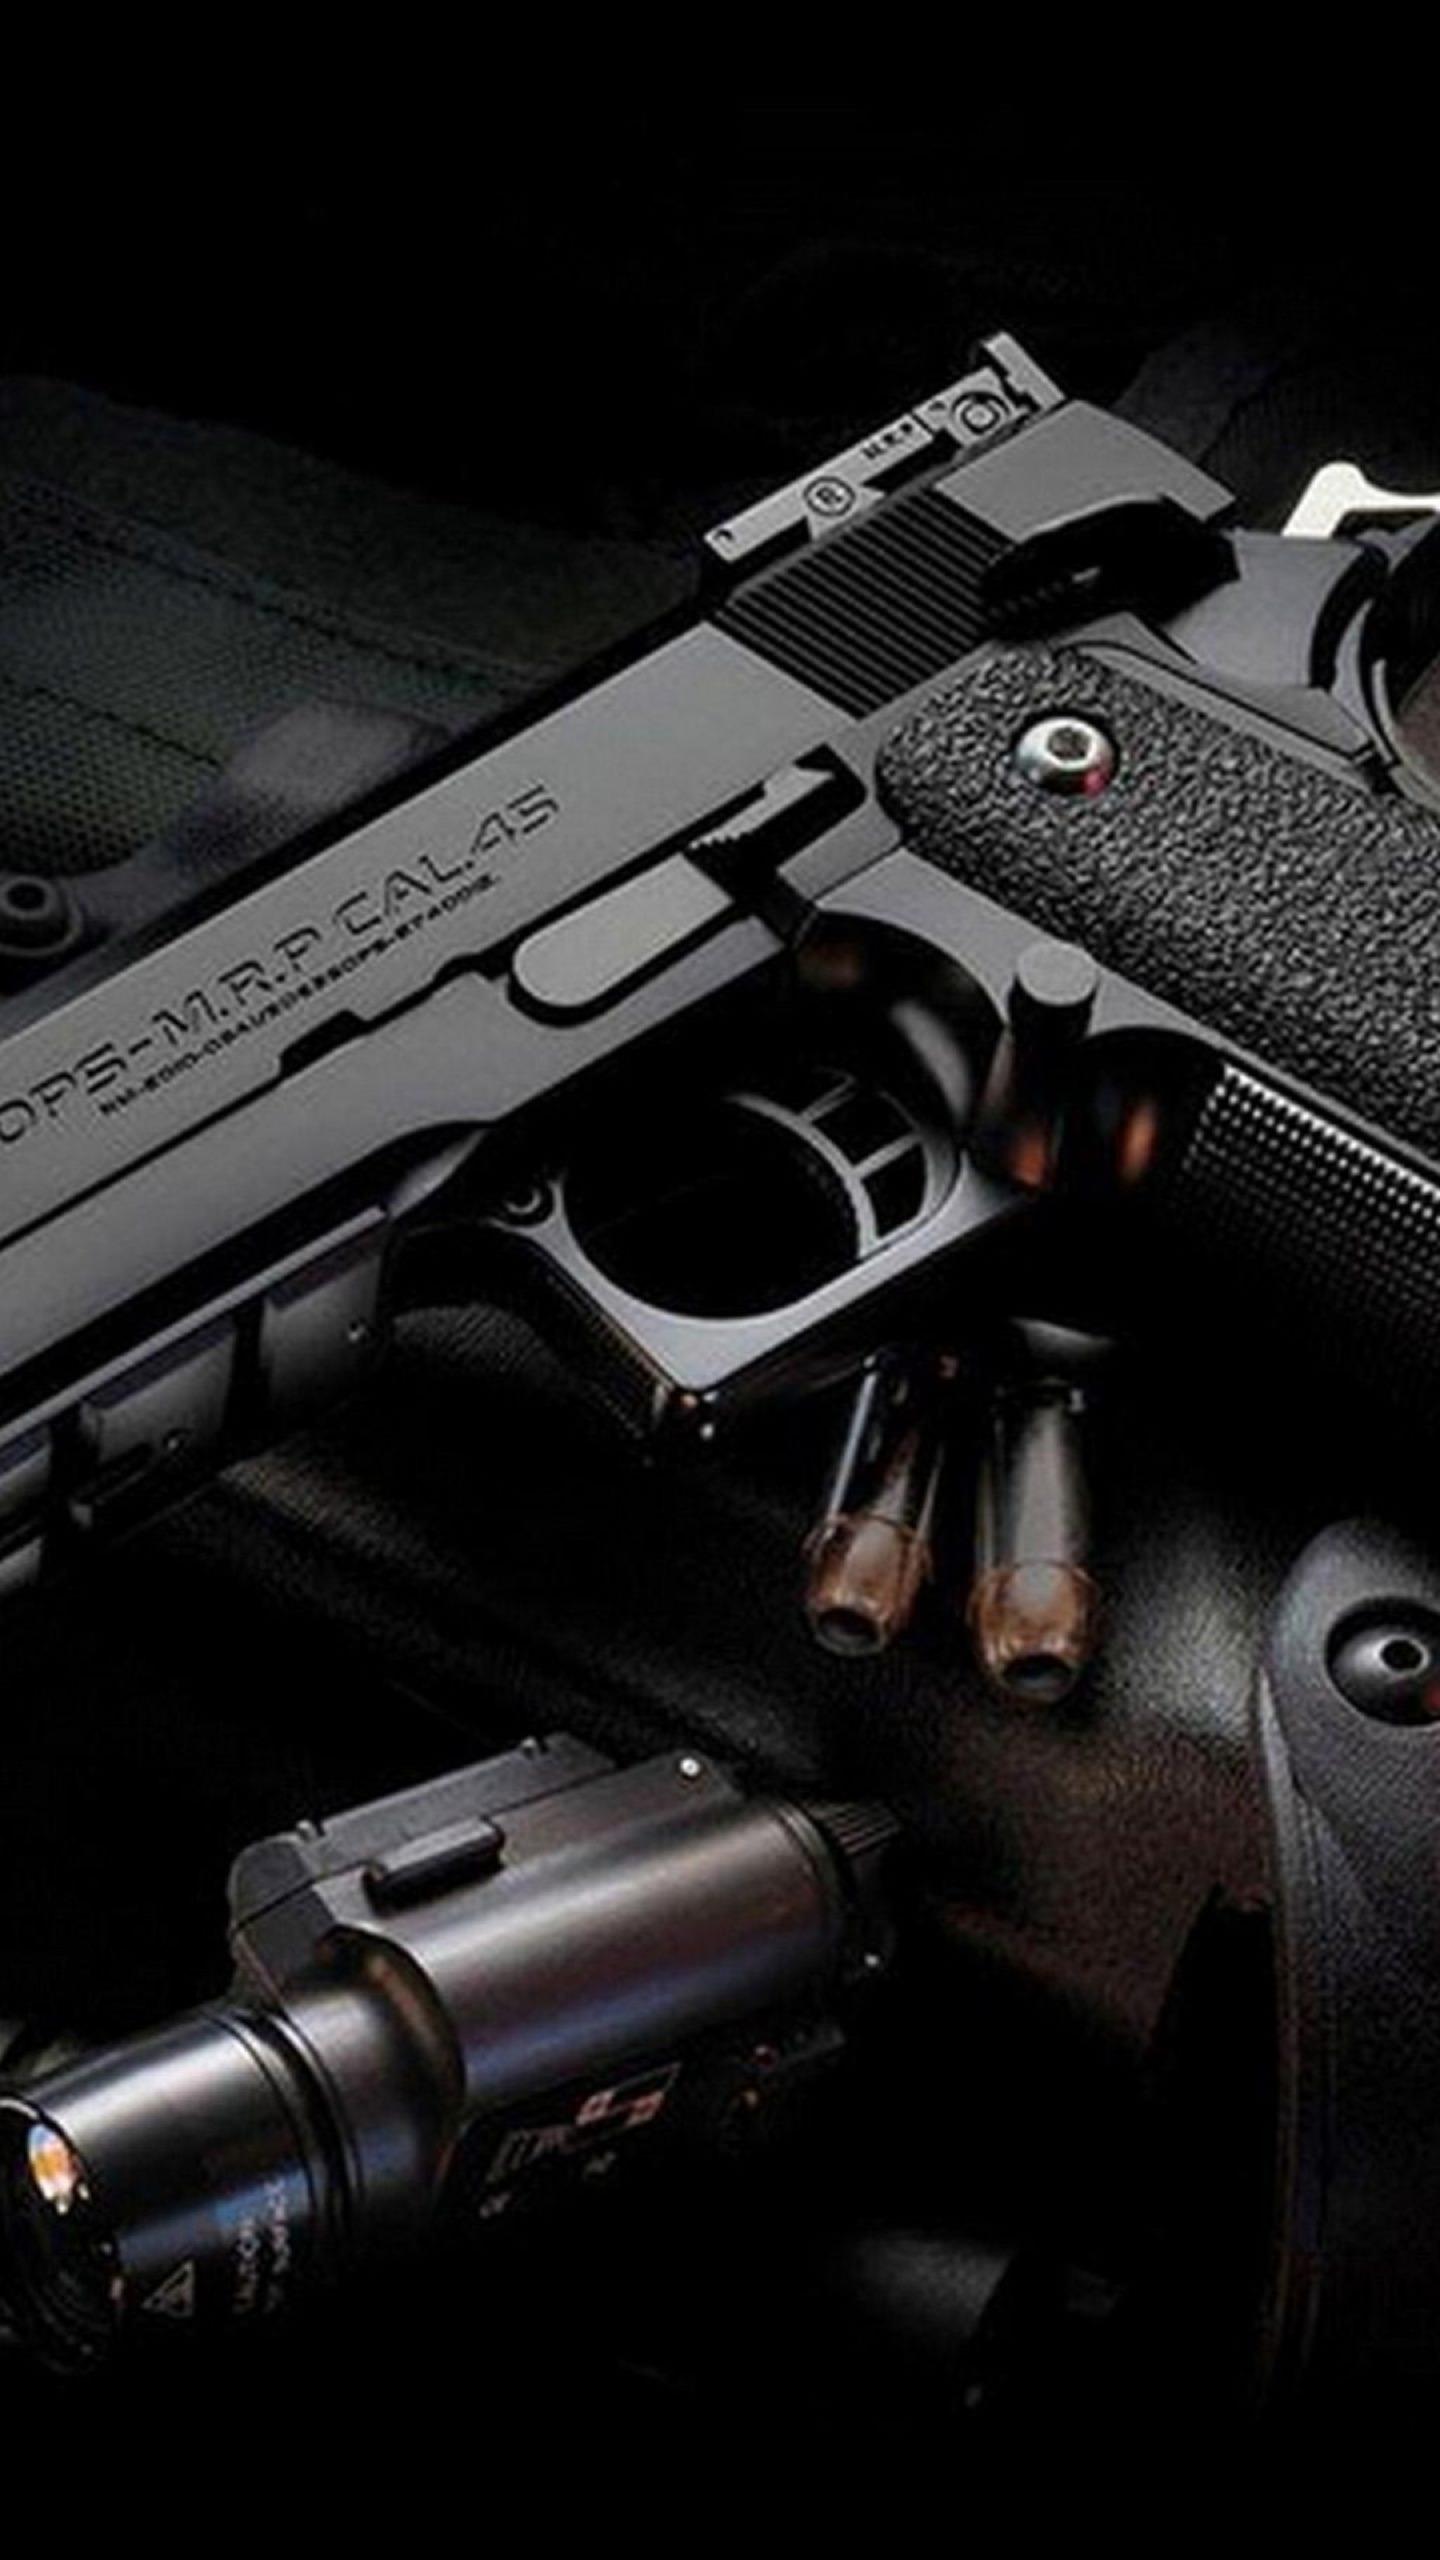 Cool black gun wallpapersc SmartPhone 1440x2560